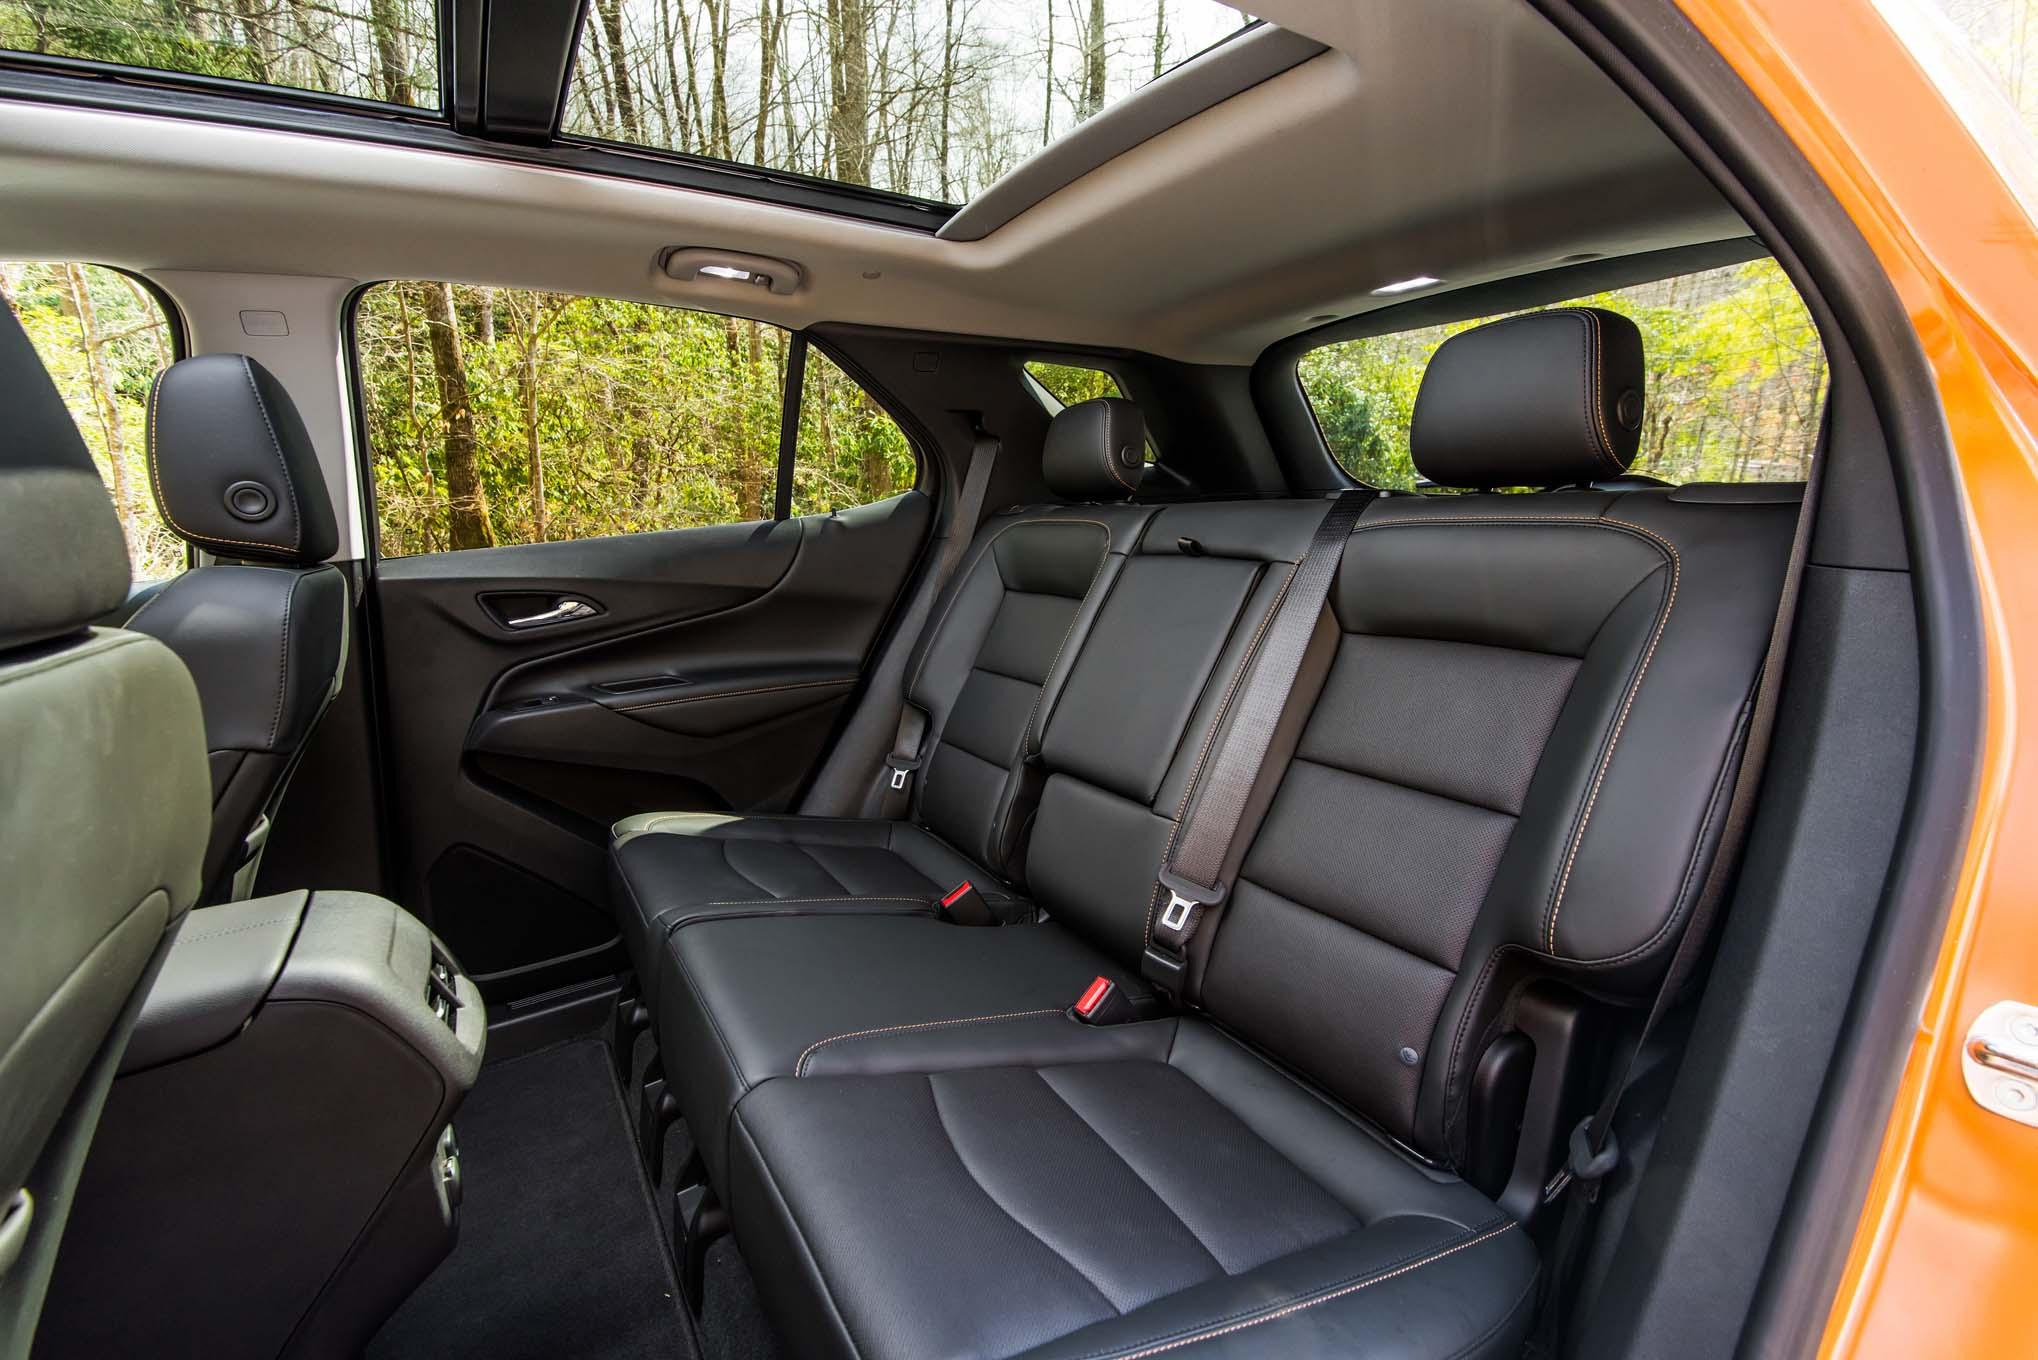 2018 Chevy Trailblazer seats VEHICLE FAVORITES t